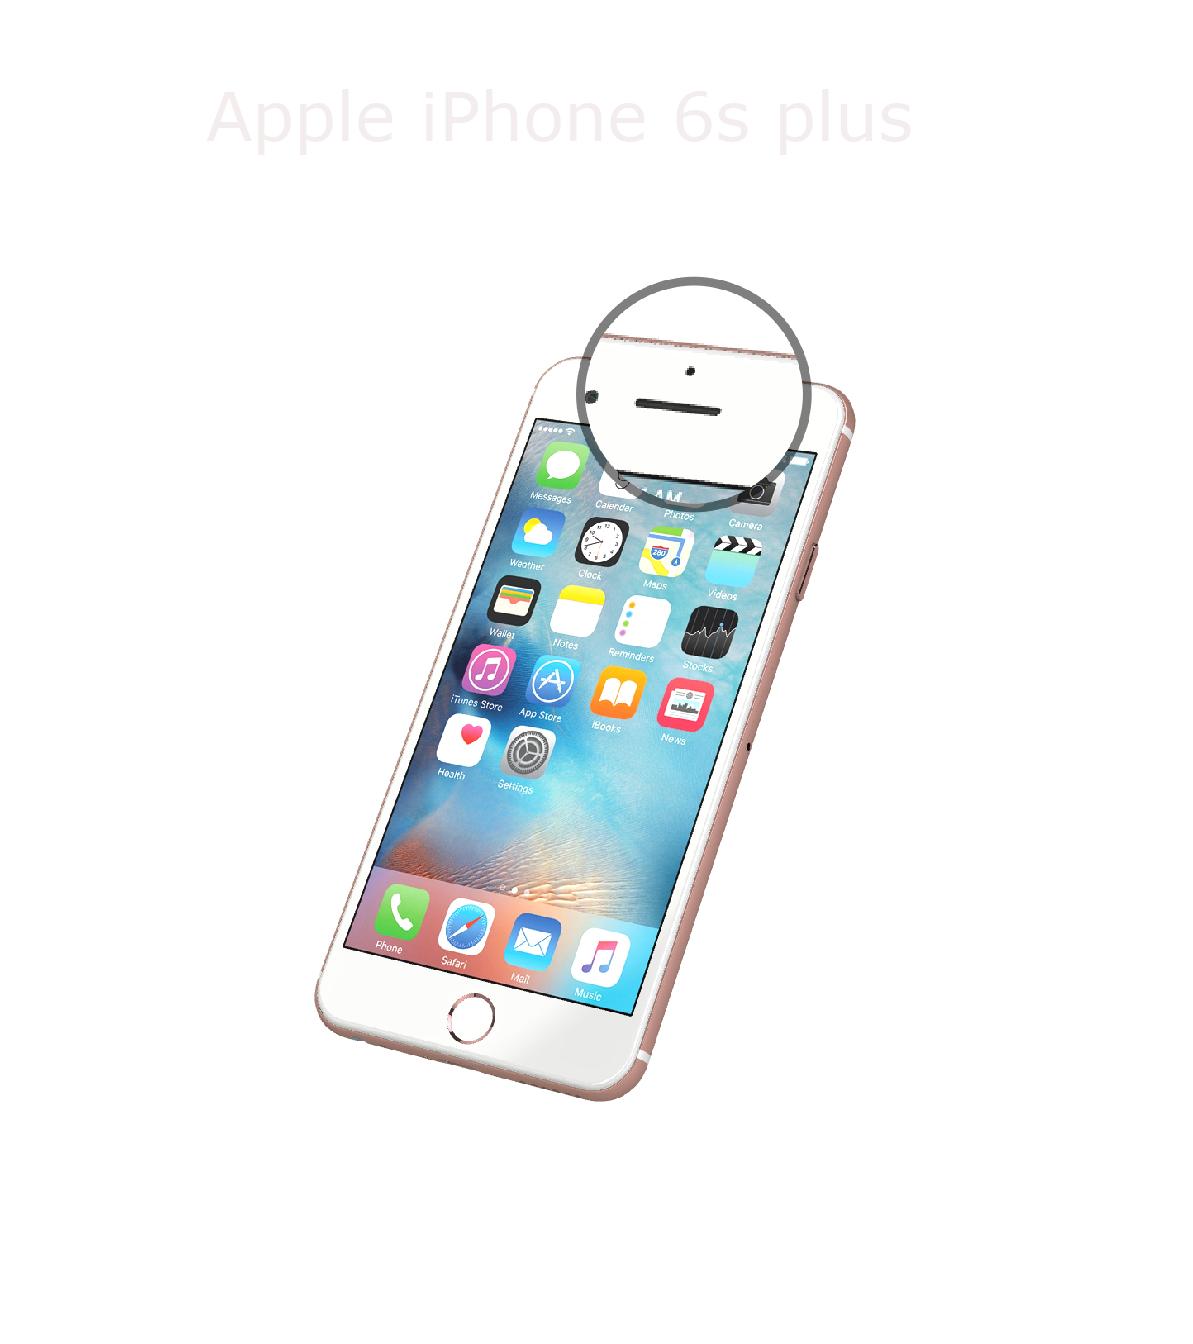 Laga samtalshögtalare iPhone 6s plus